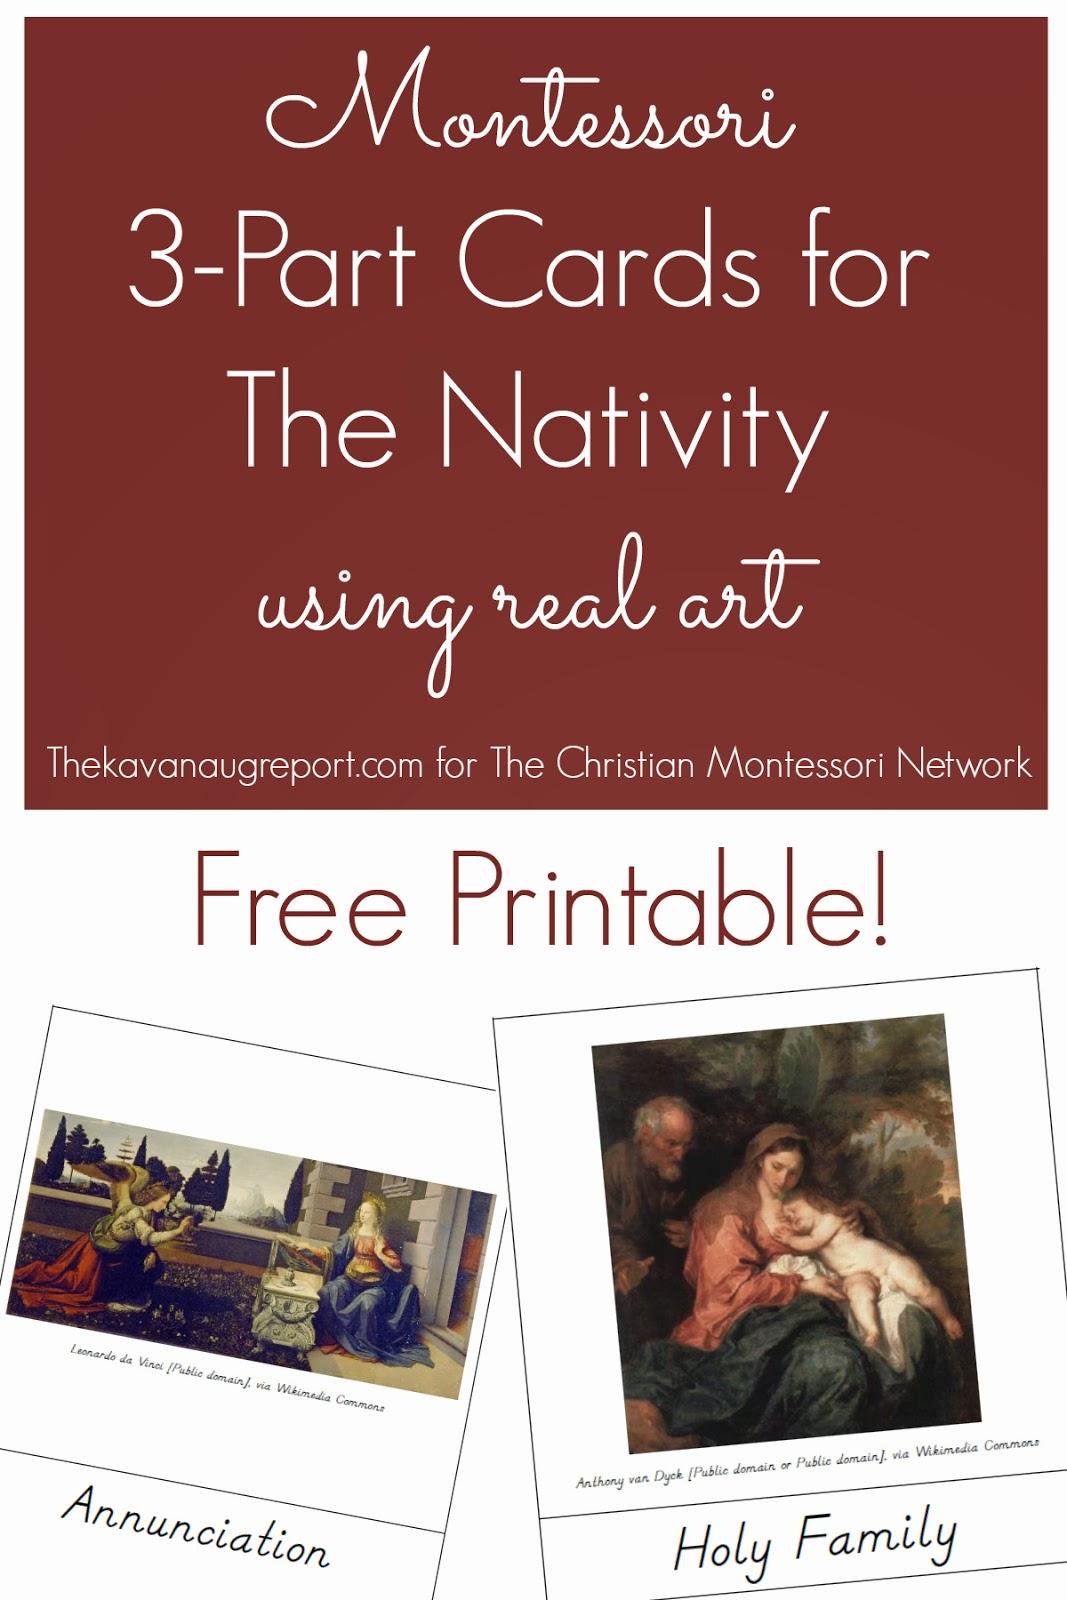 Montessori Nativity 3-Part Cards